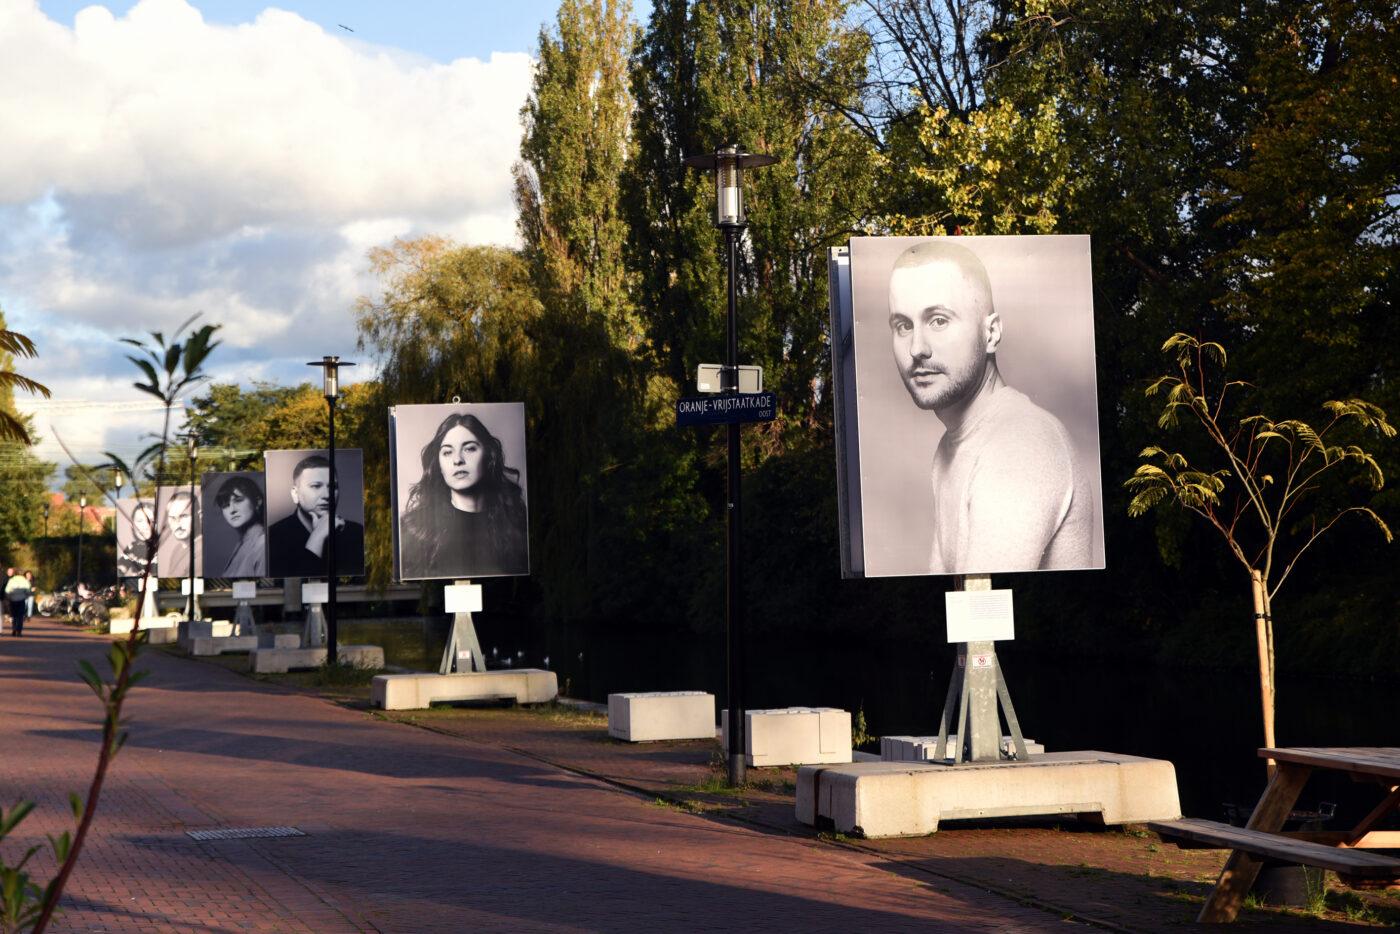 Tijdelijk Monument door Bosnian Girl - Foto: © Betul Ellialtioglu, Framer Framed (2020)